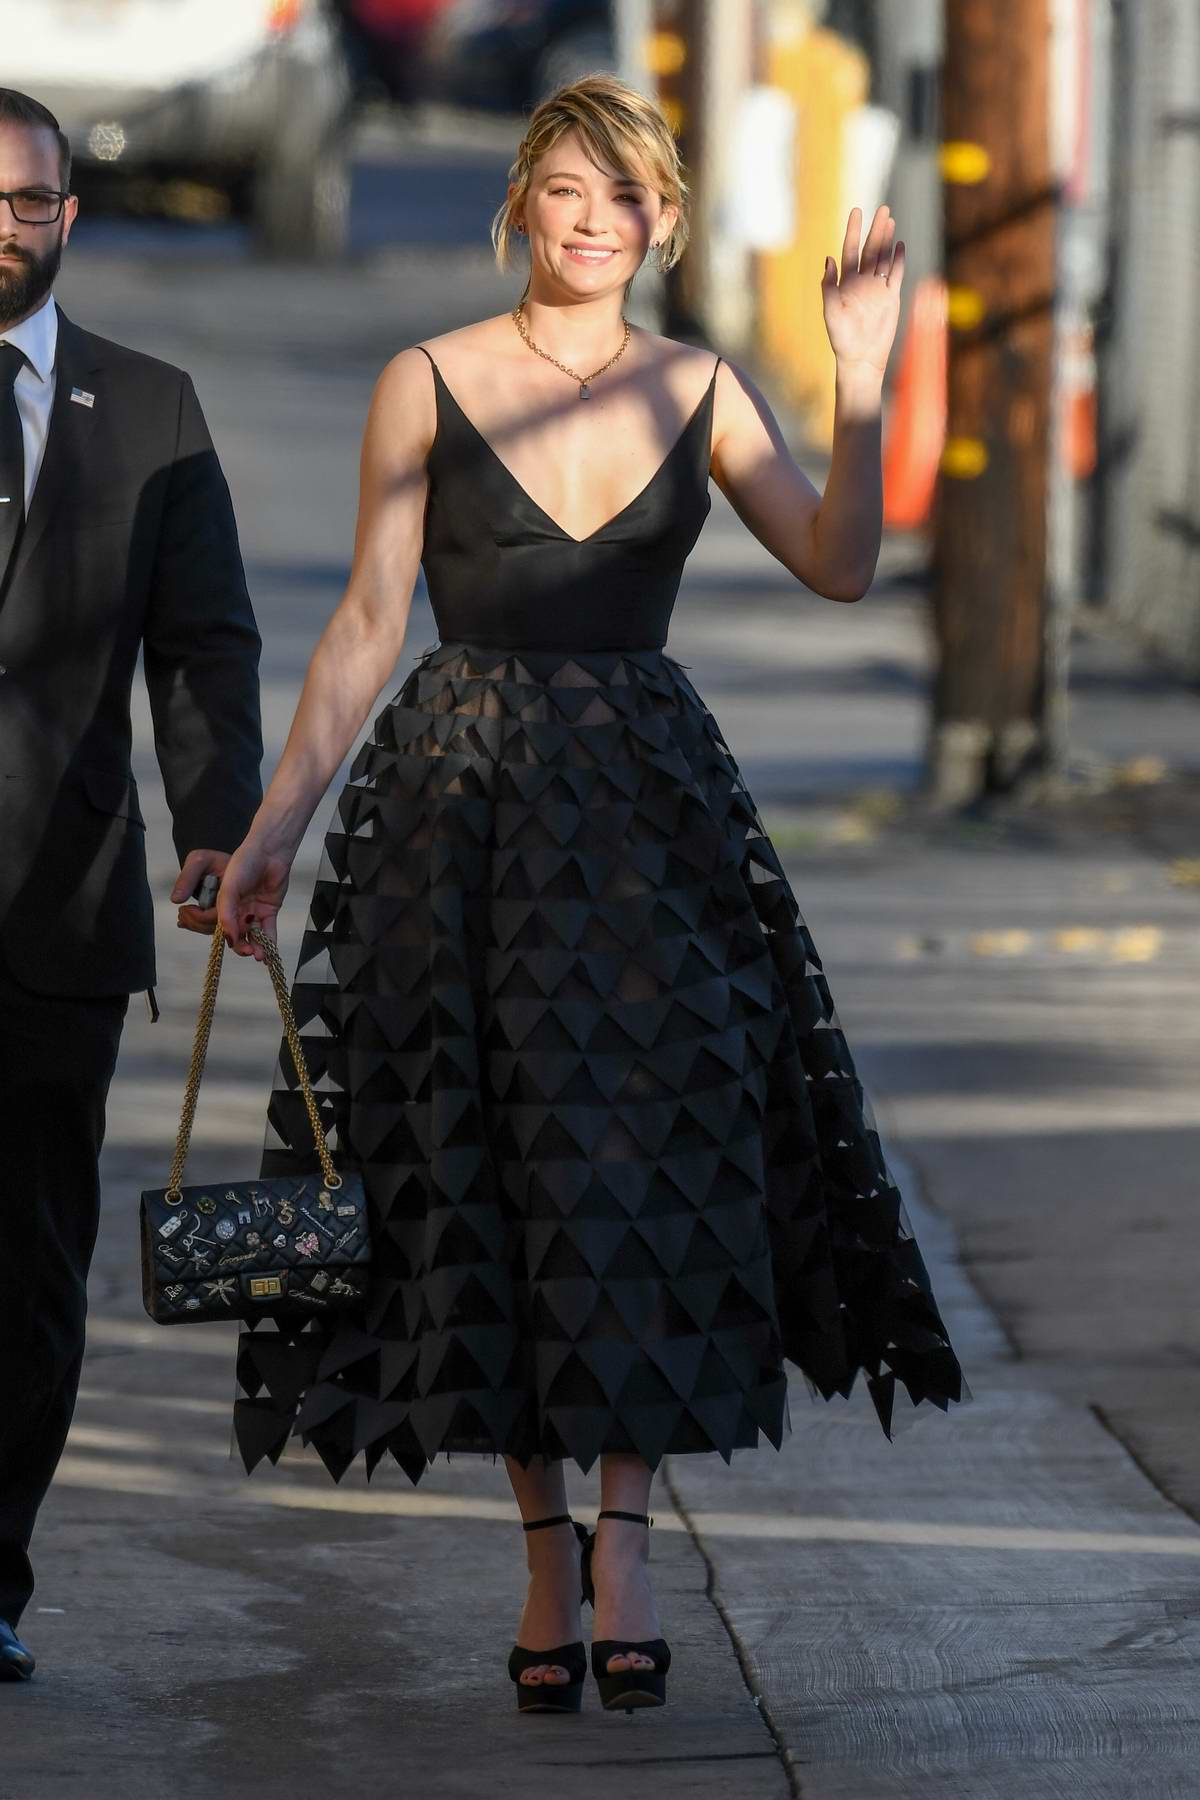 Haley Bennett arriving for Jimmy Kimel Live! in Hollywood, Los Angeles